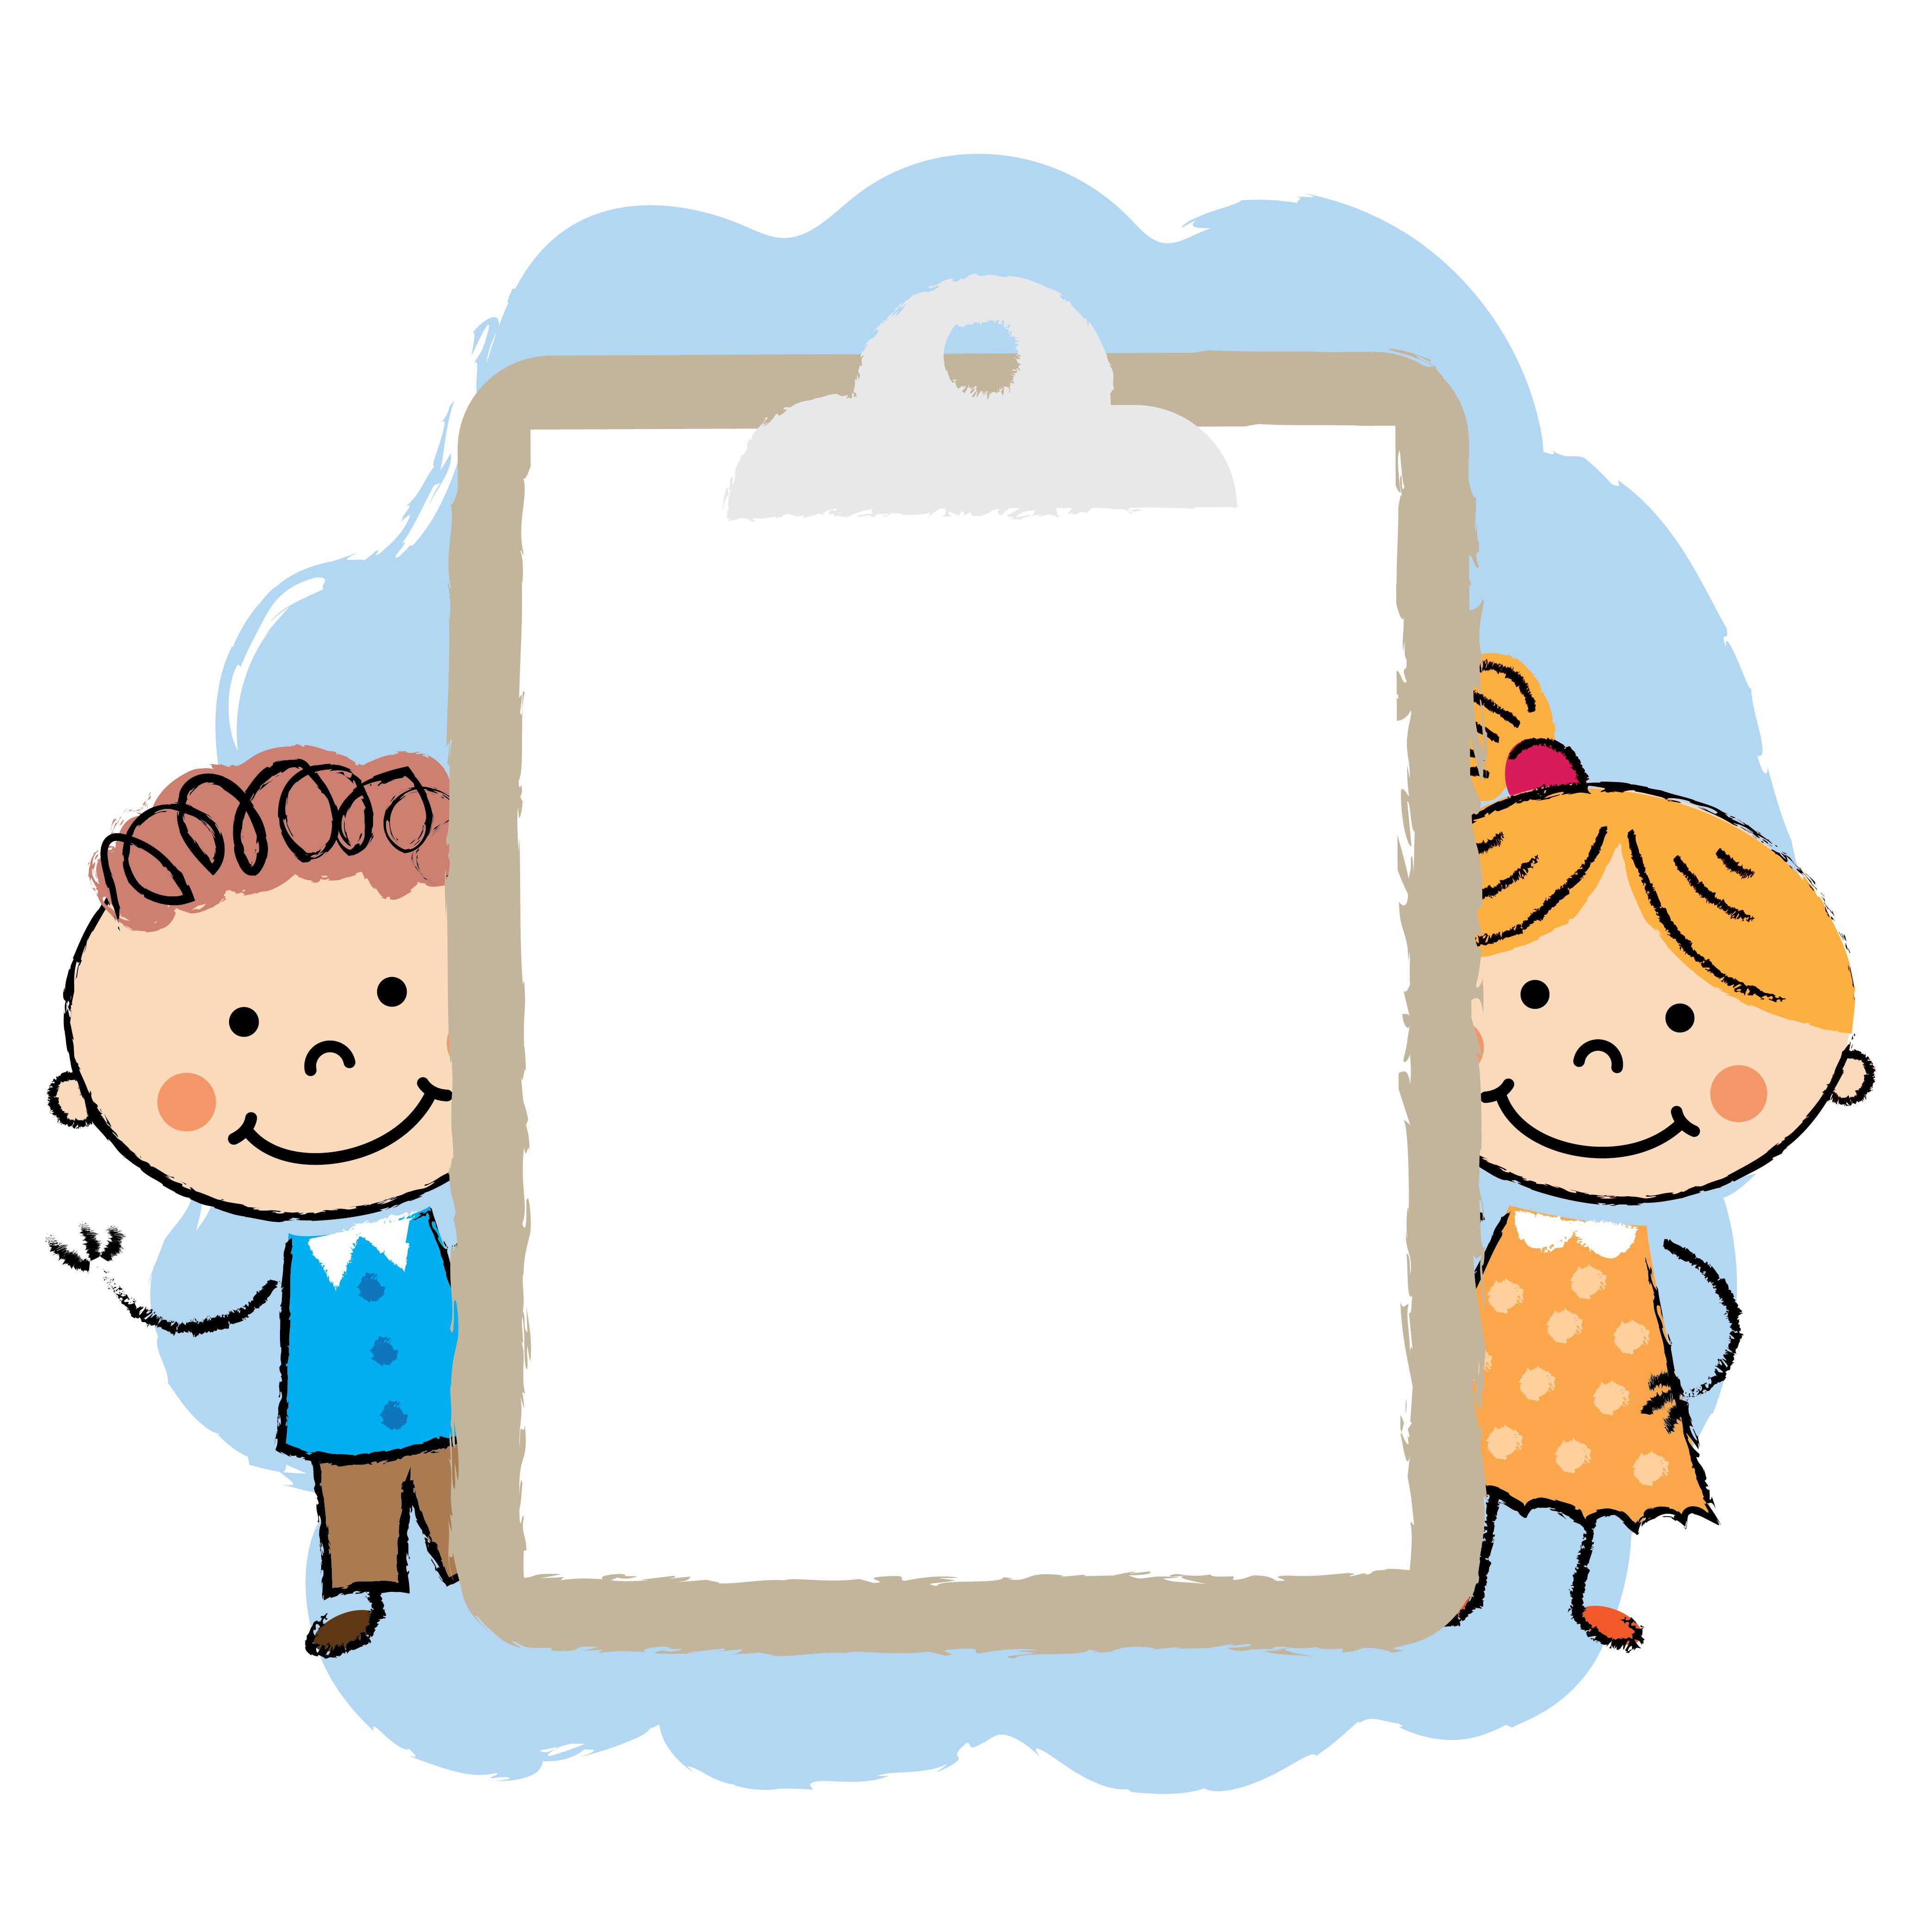 Cute cartoon kids frame - Download Free Vectors, Clipart ...